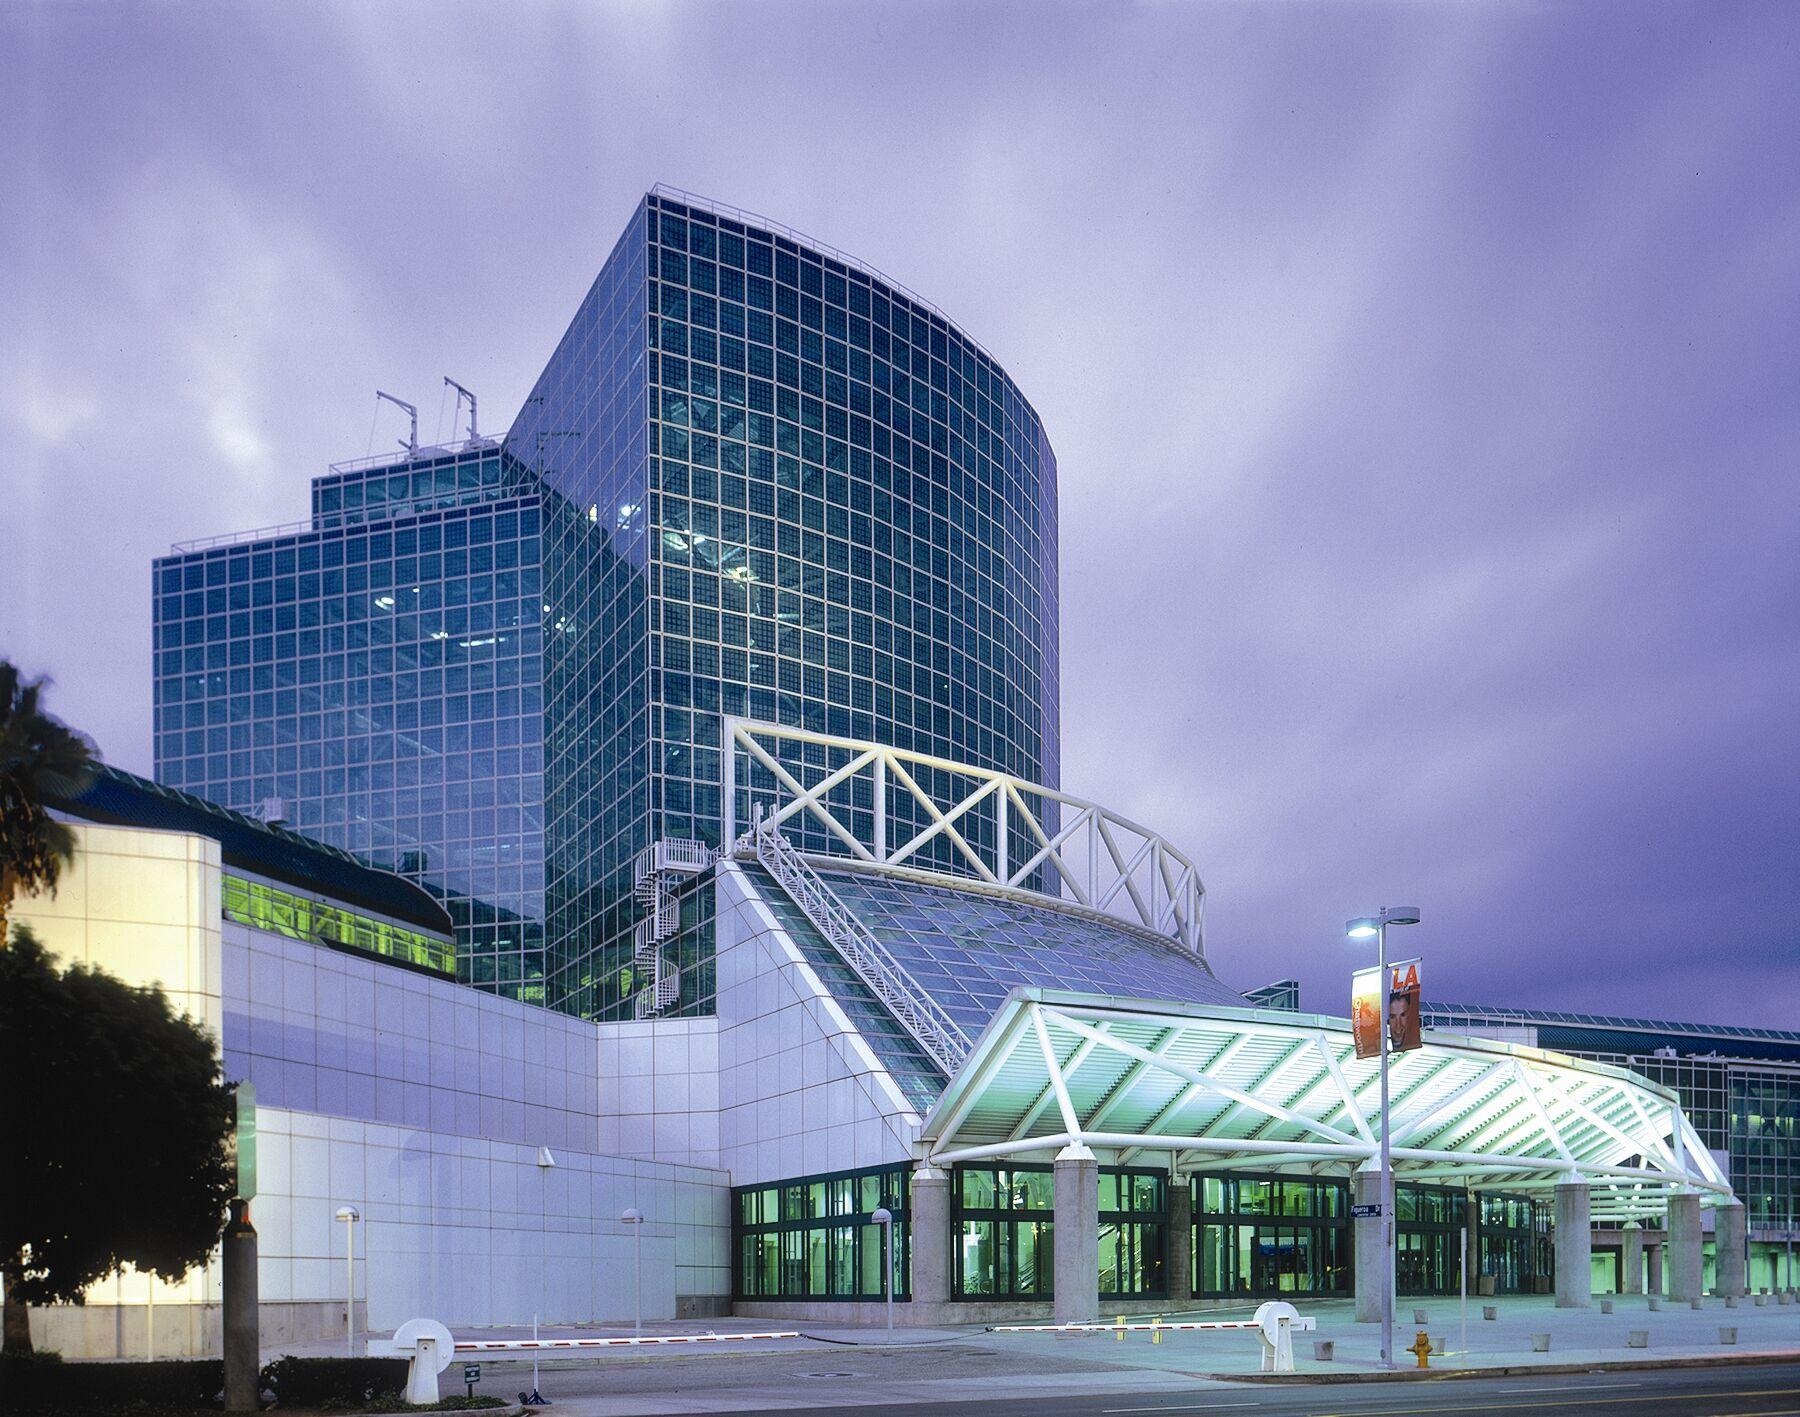 lacc-convention-center